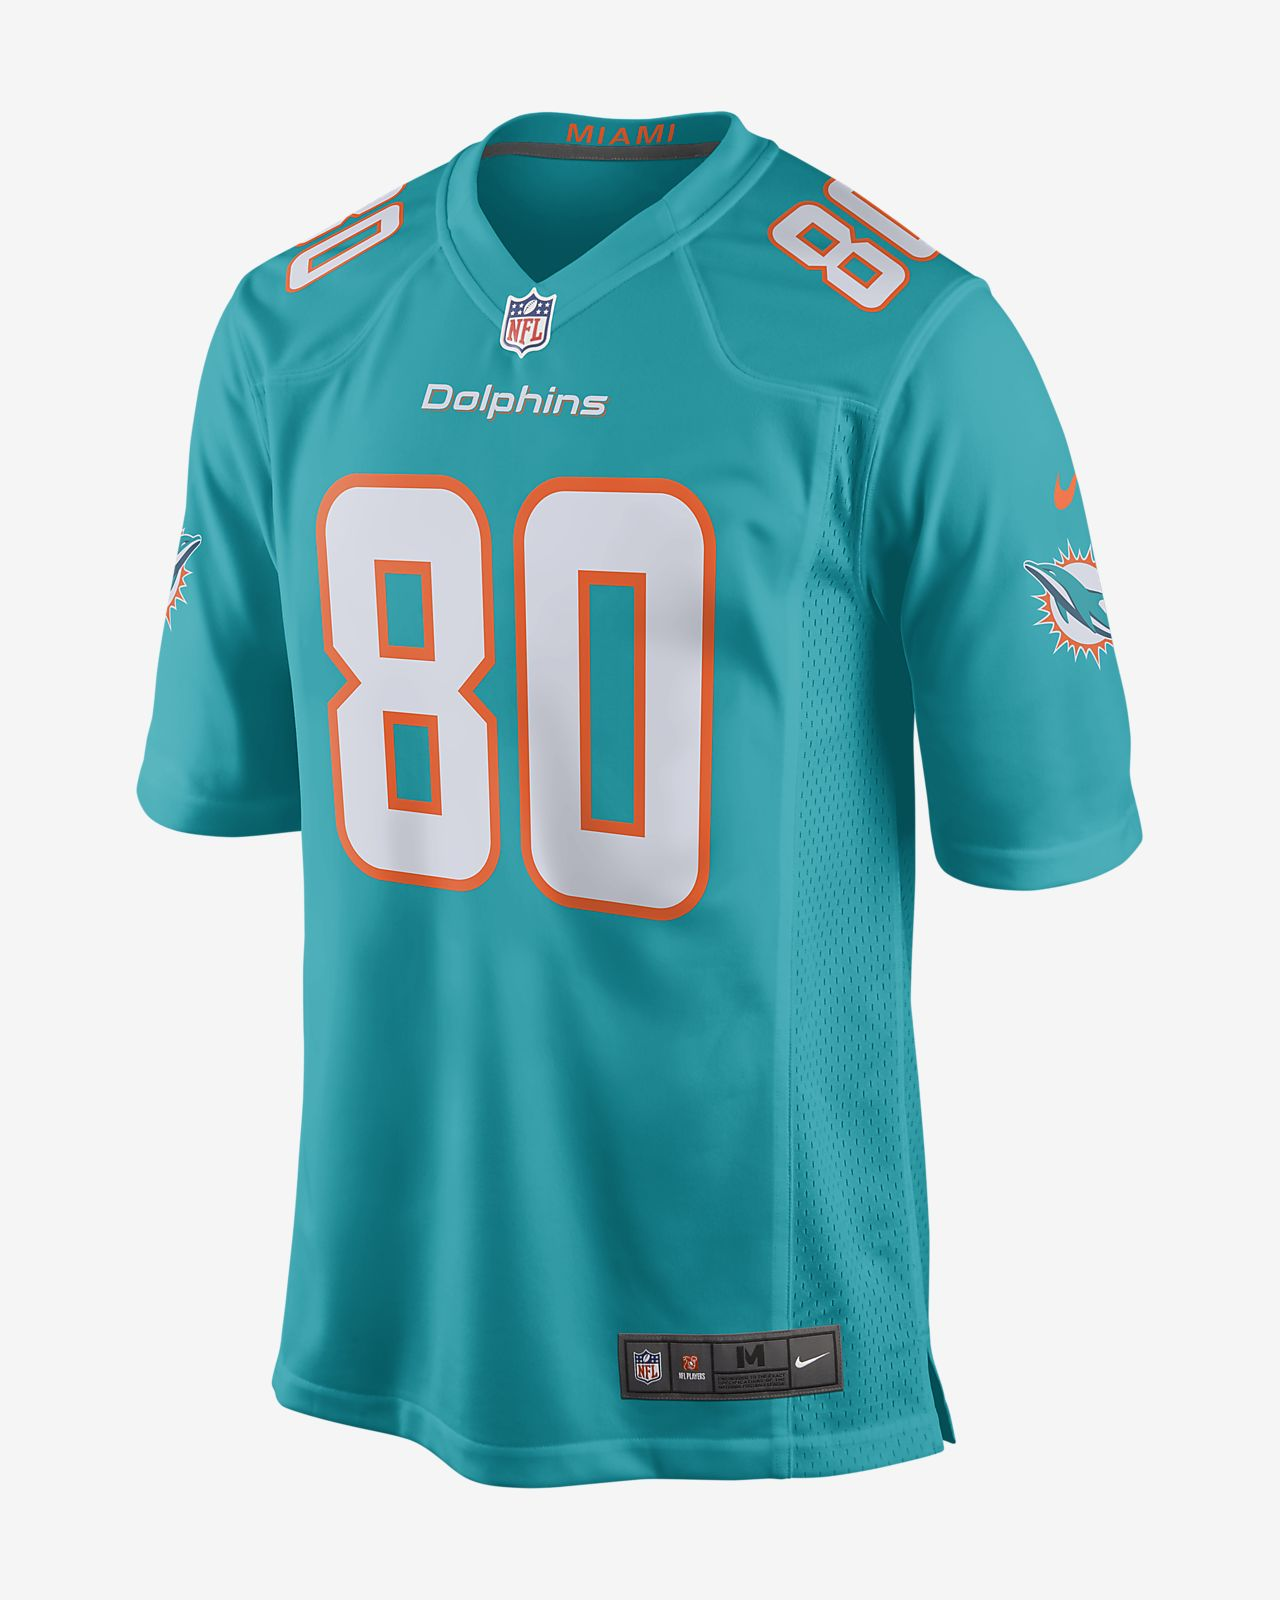 NFL Miami Dolphins (Danny Amendola) American-Football-Spieltrikot für Herren